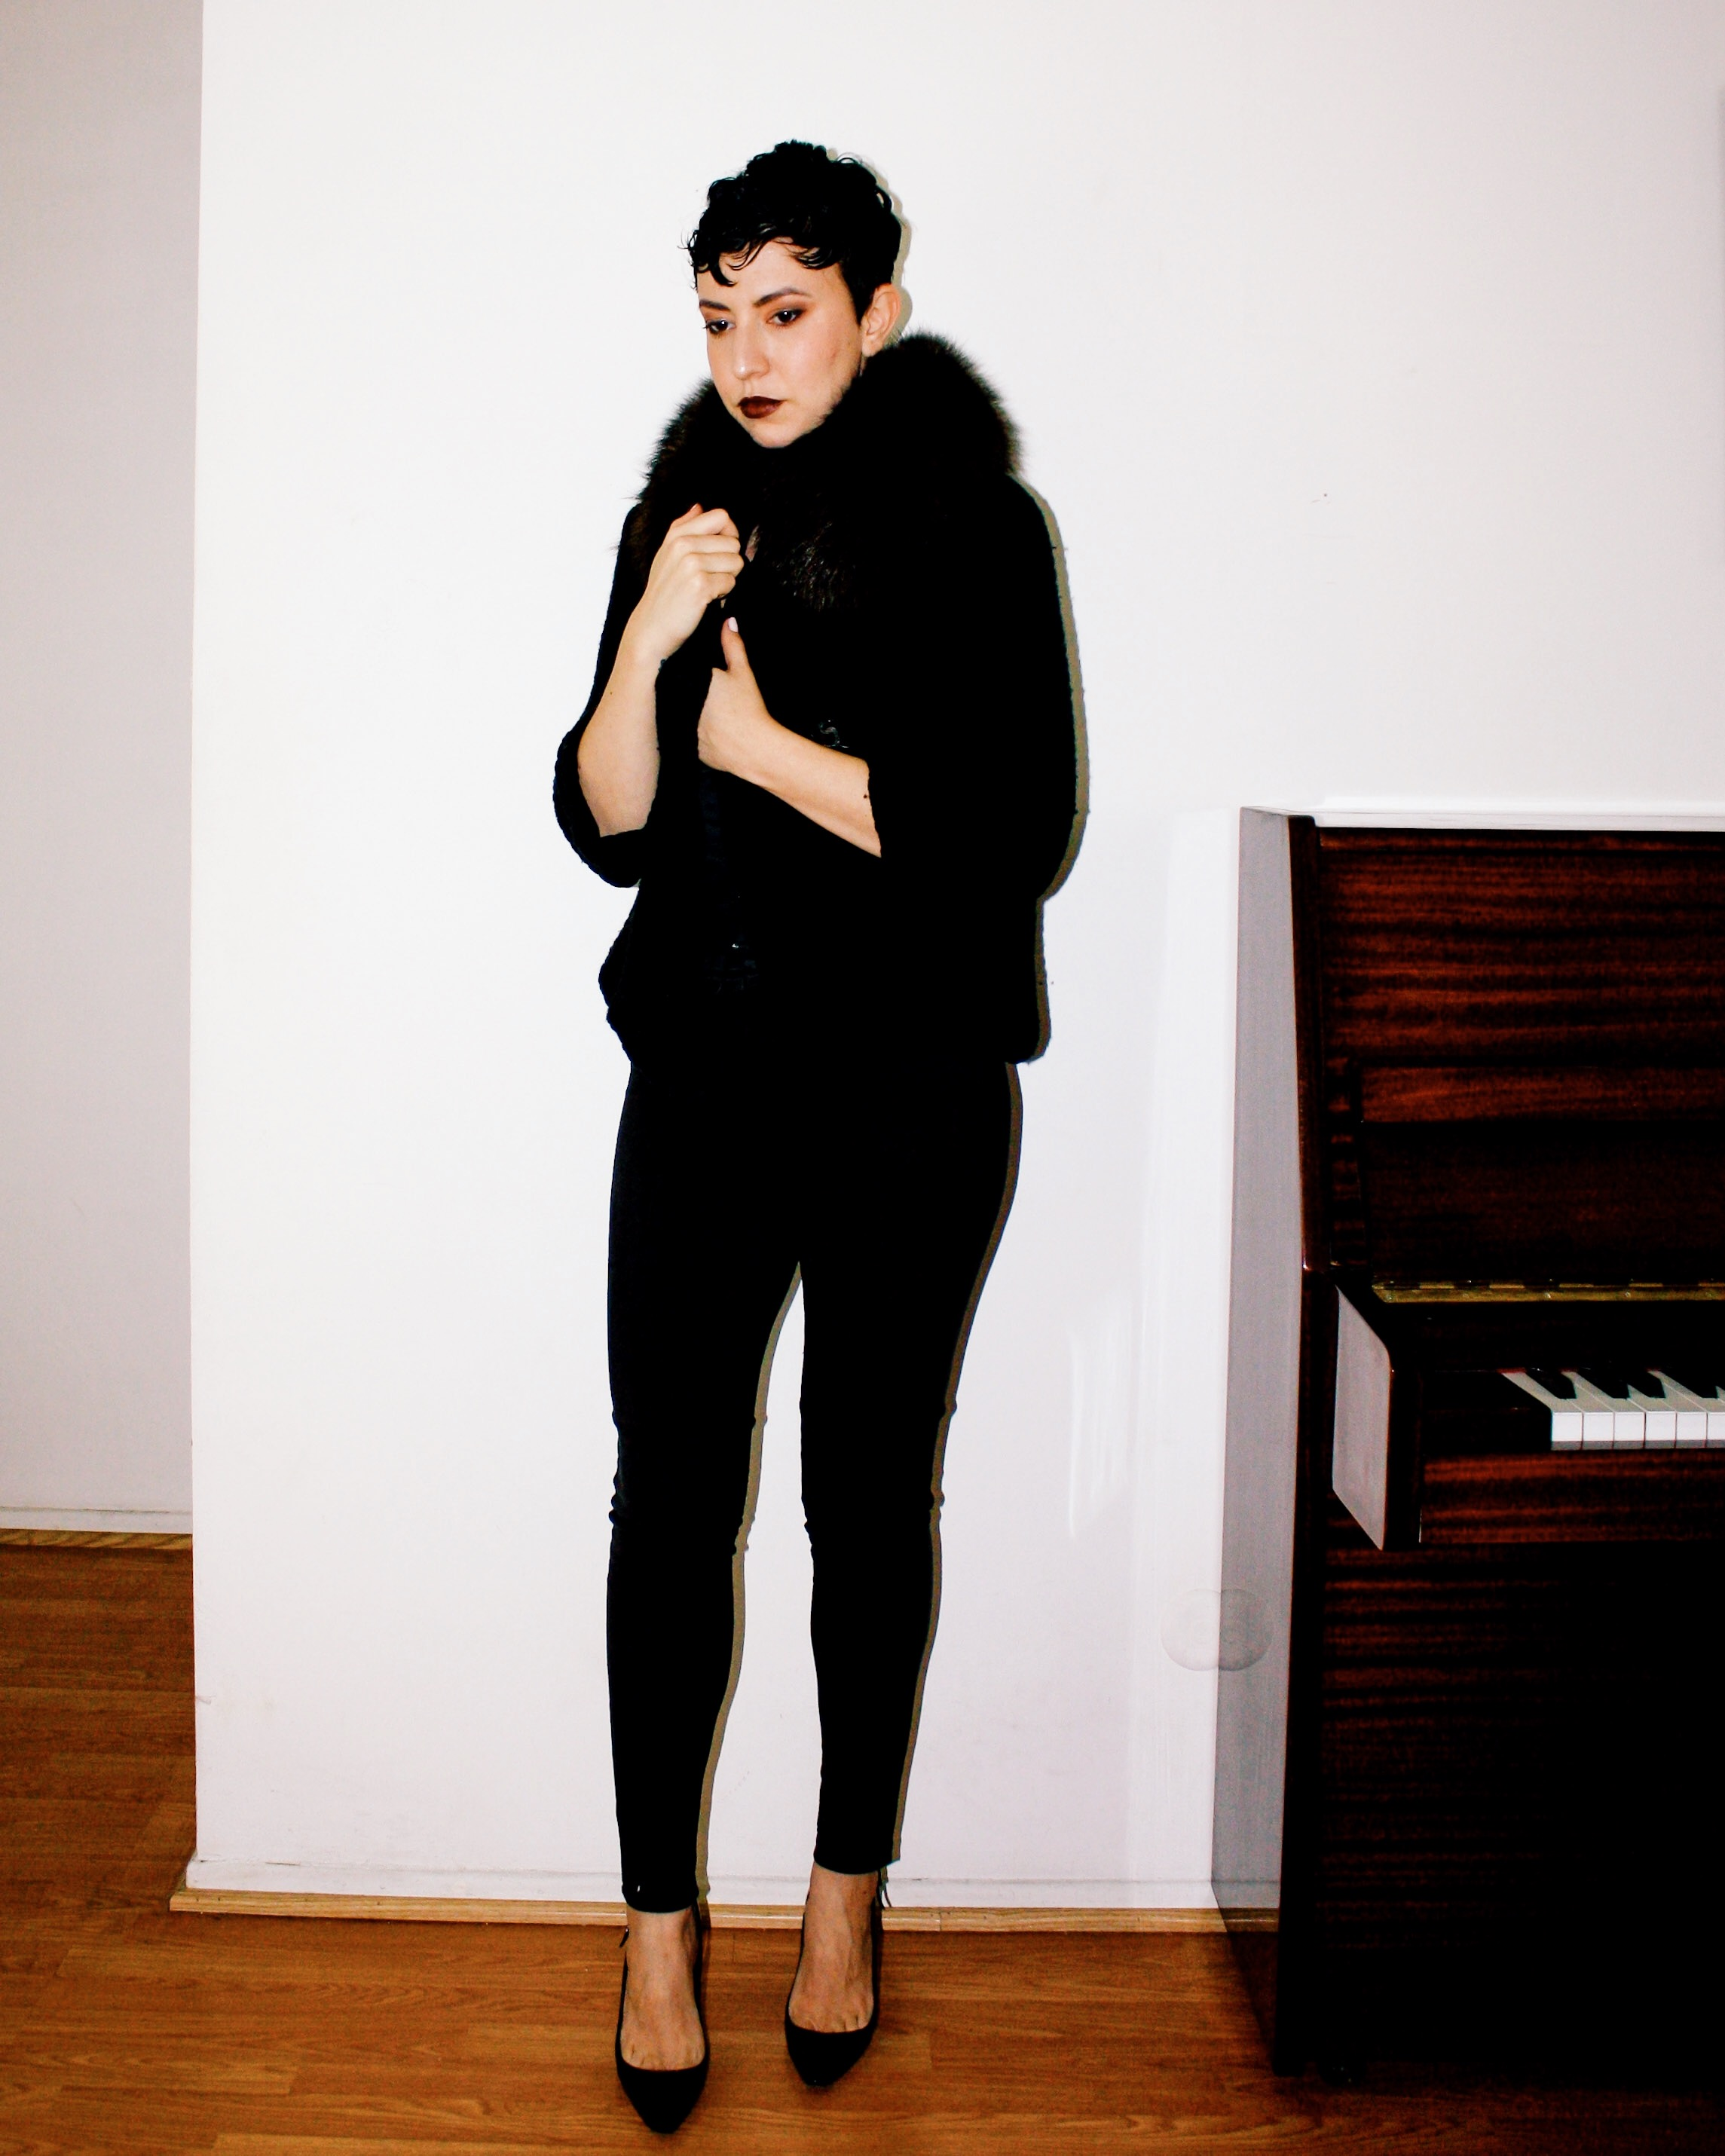 casual outfits manolo blahnik patent leather heels shoes suede pants piano white tank fur stole jacket corset belt 2